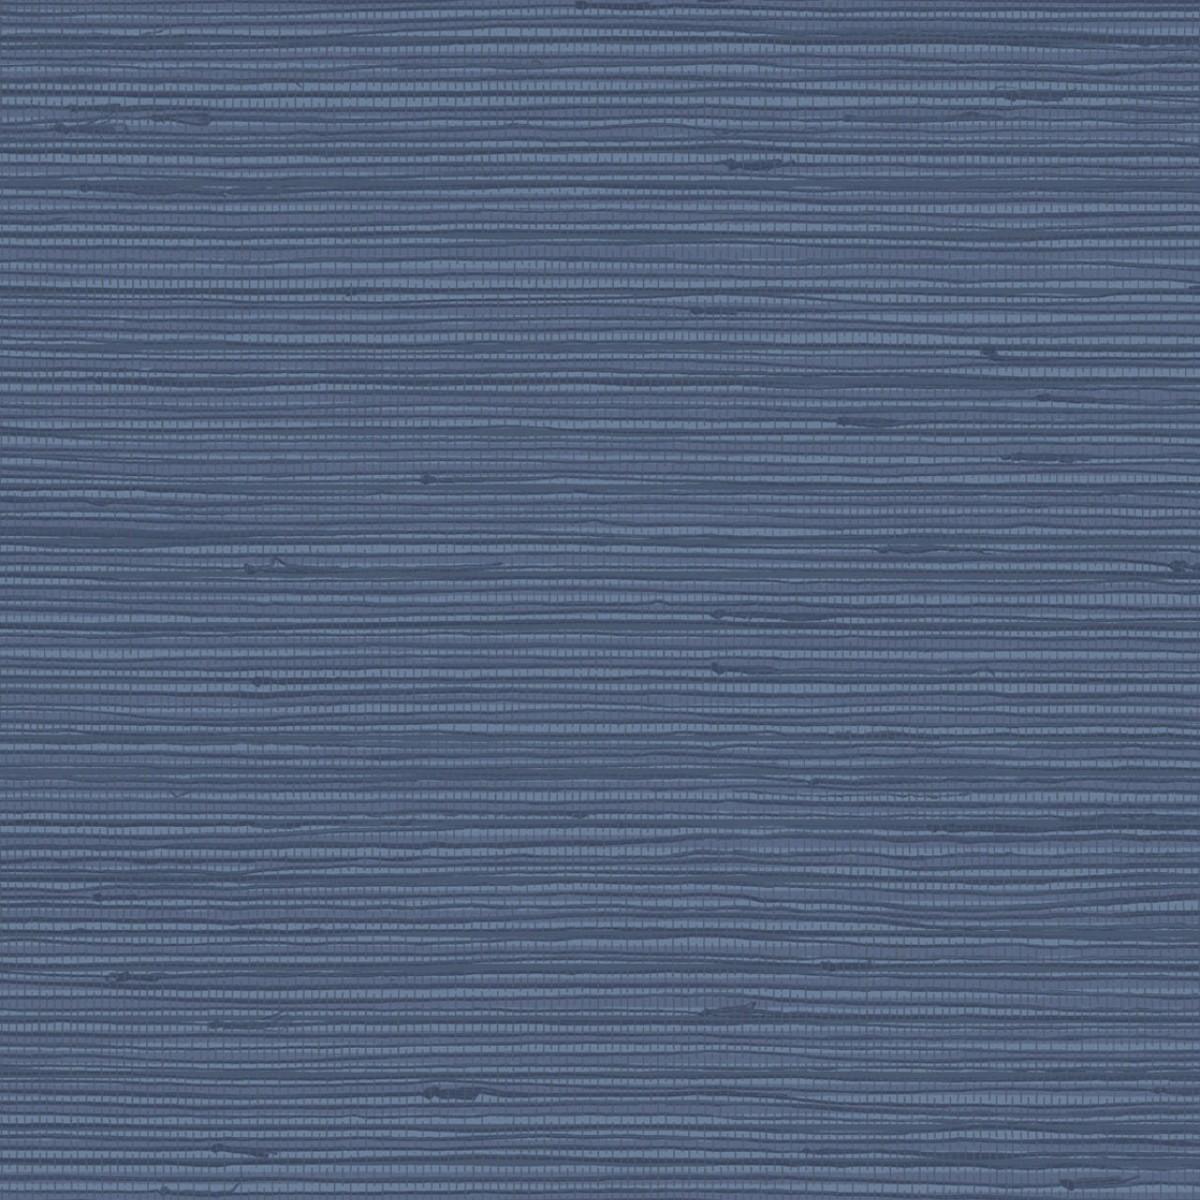 Tapet lavabil Blend 363035, 5.2mp / rolă, Eijffinger